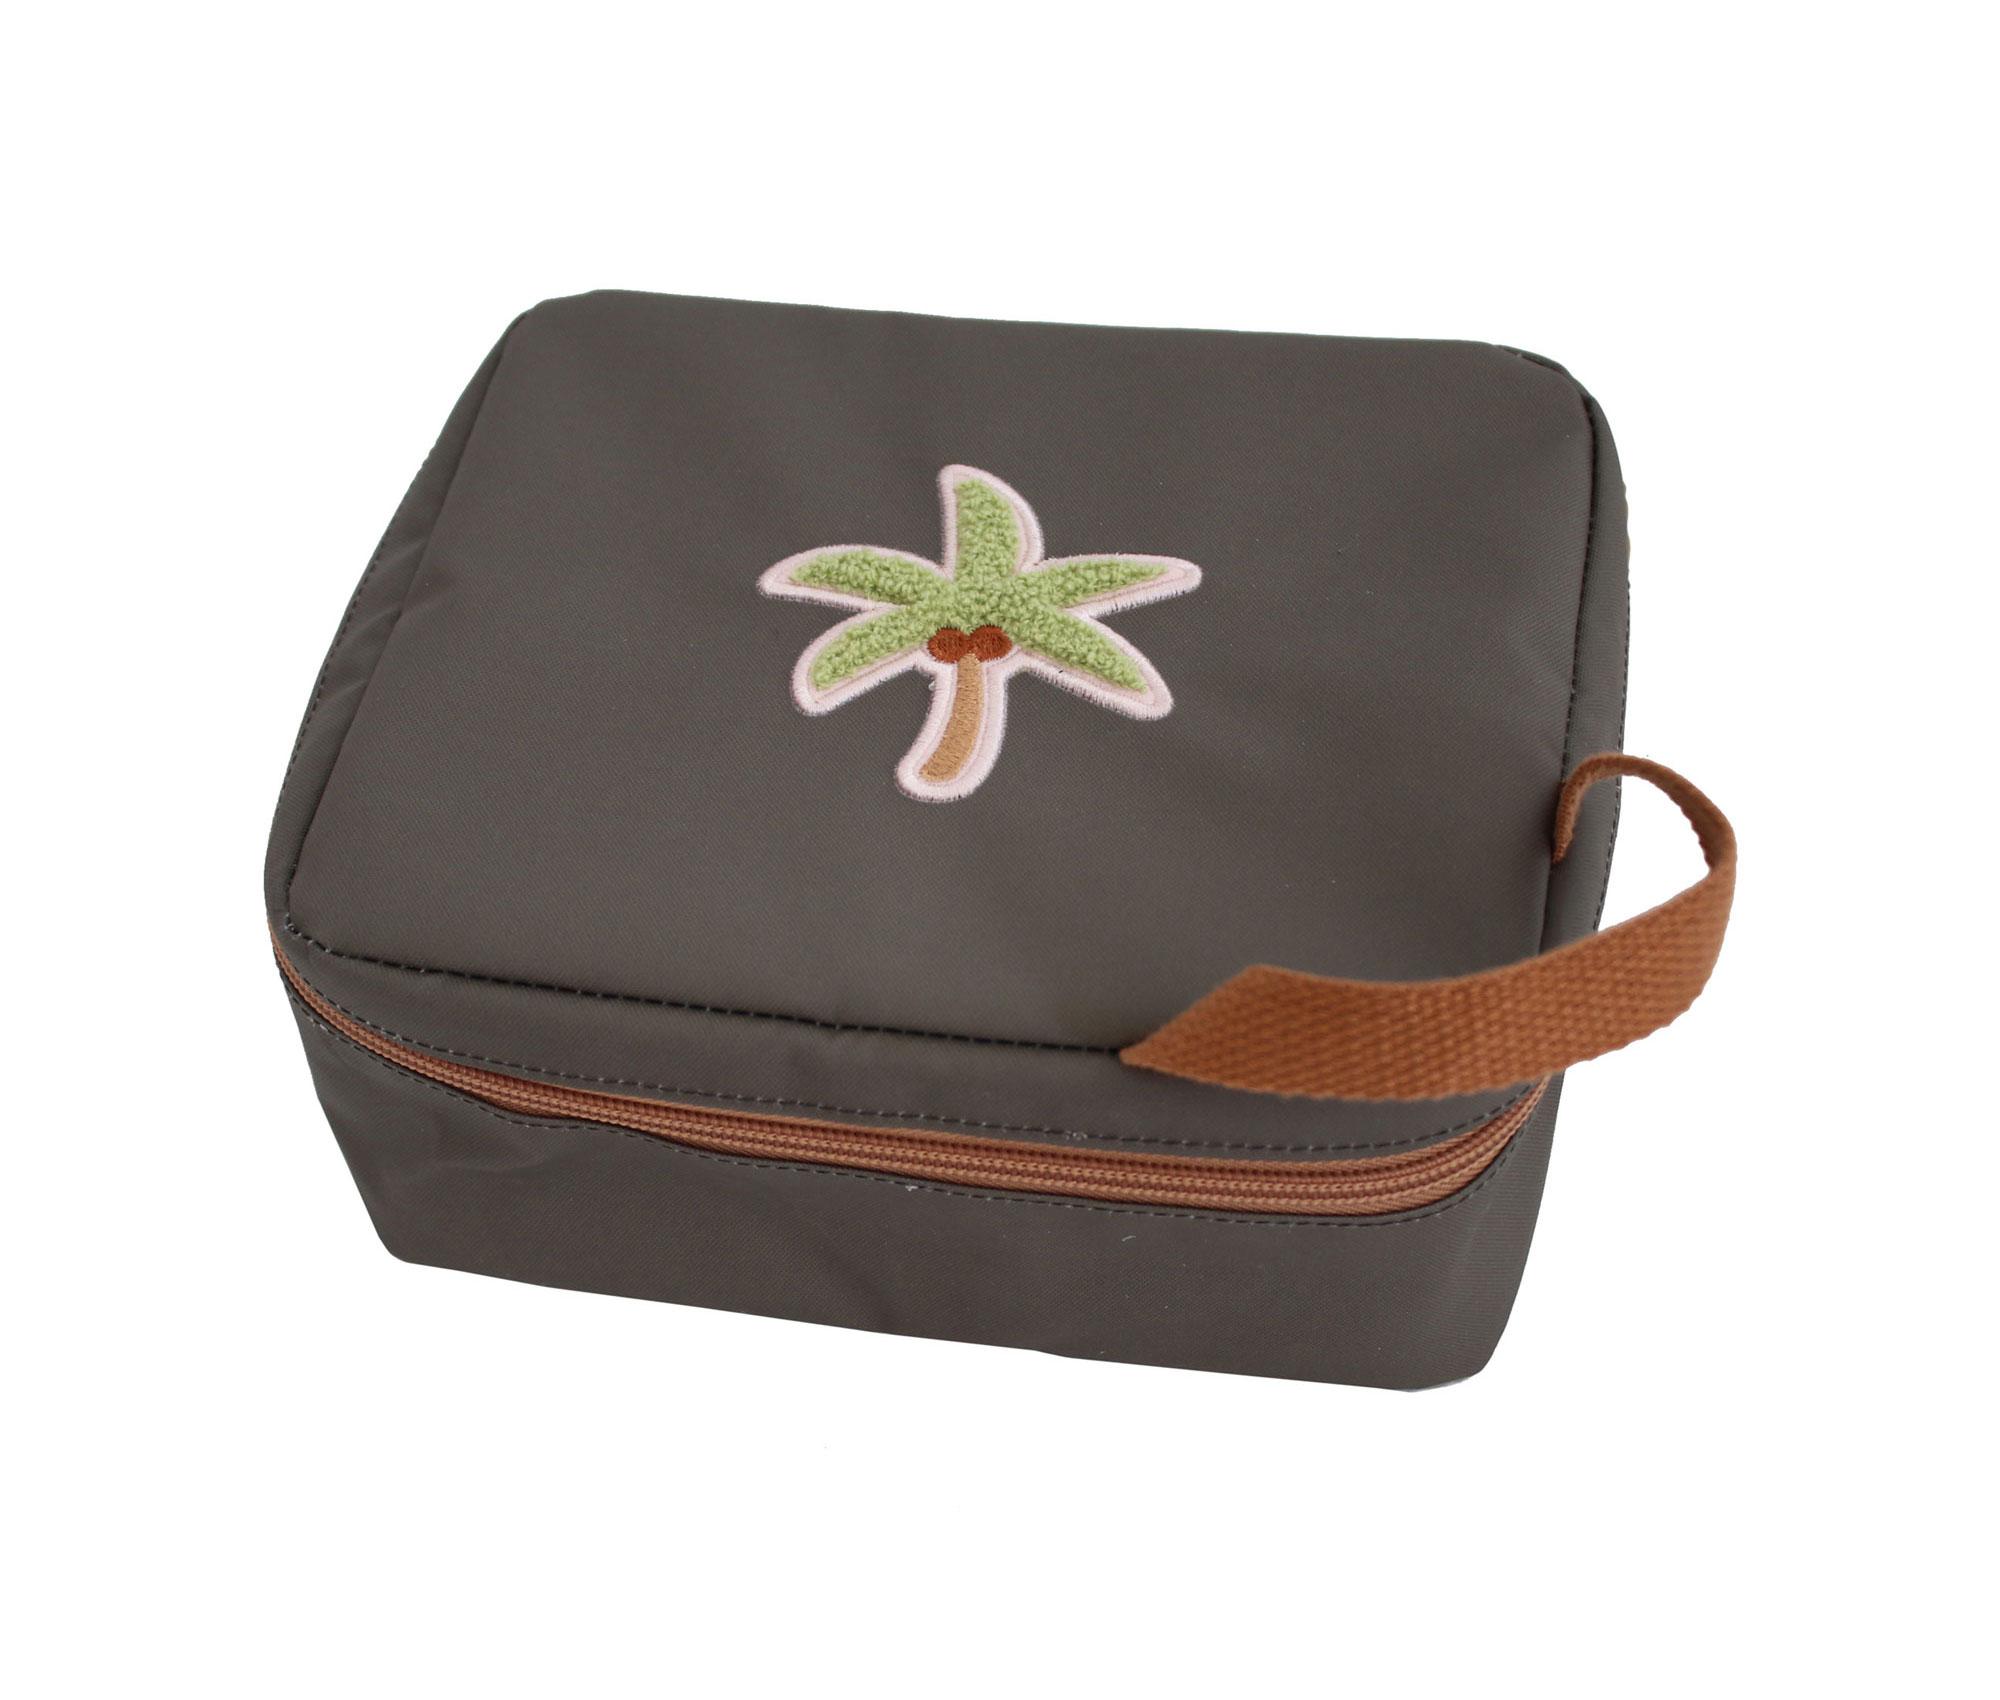 Isoliertasche Lunch Bag Mäppchen Tropical Palme graugrün 20,5x7x9 cm